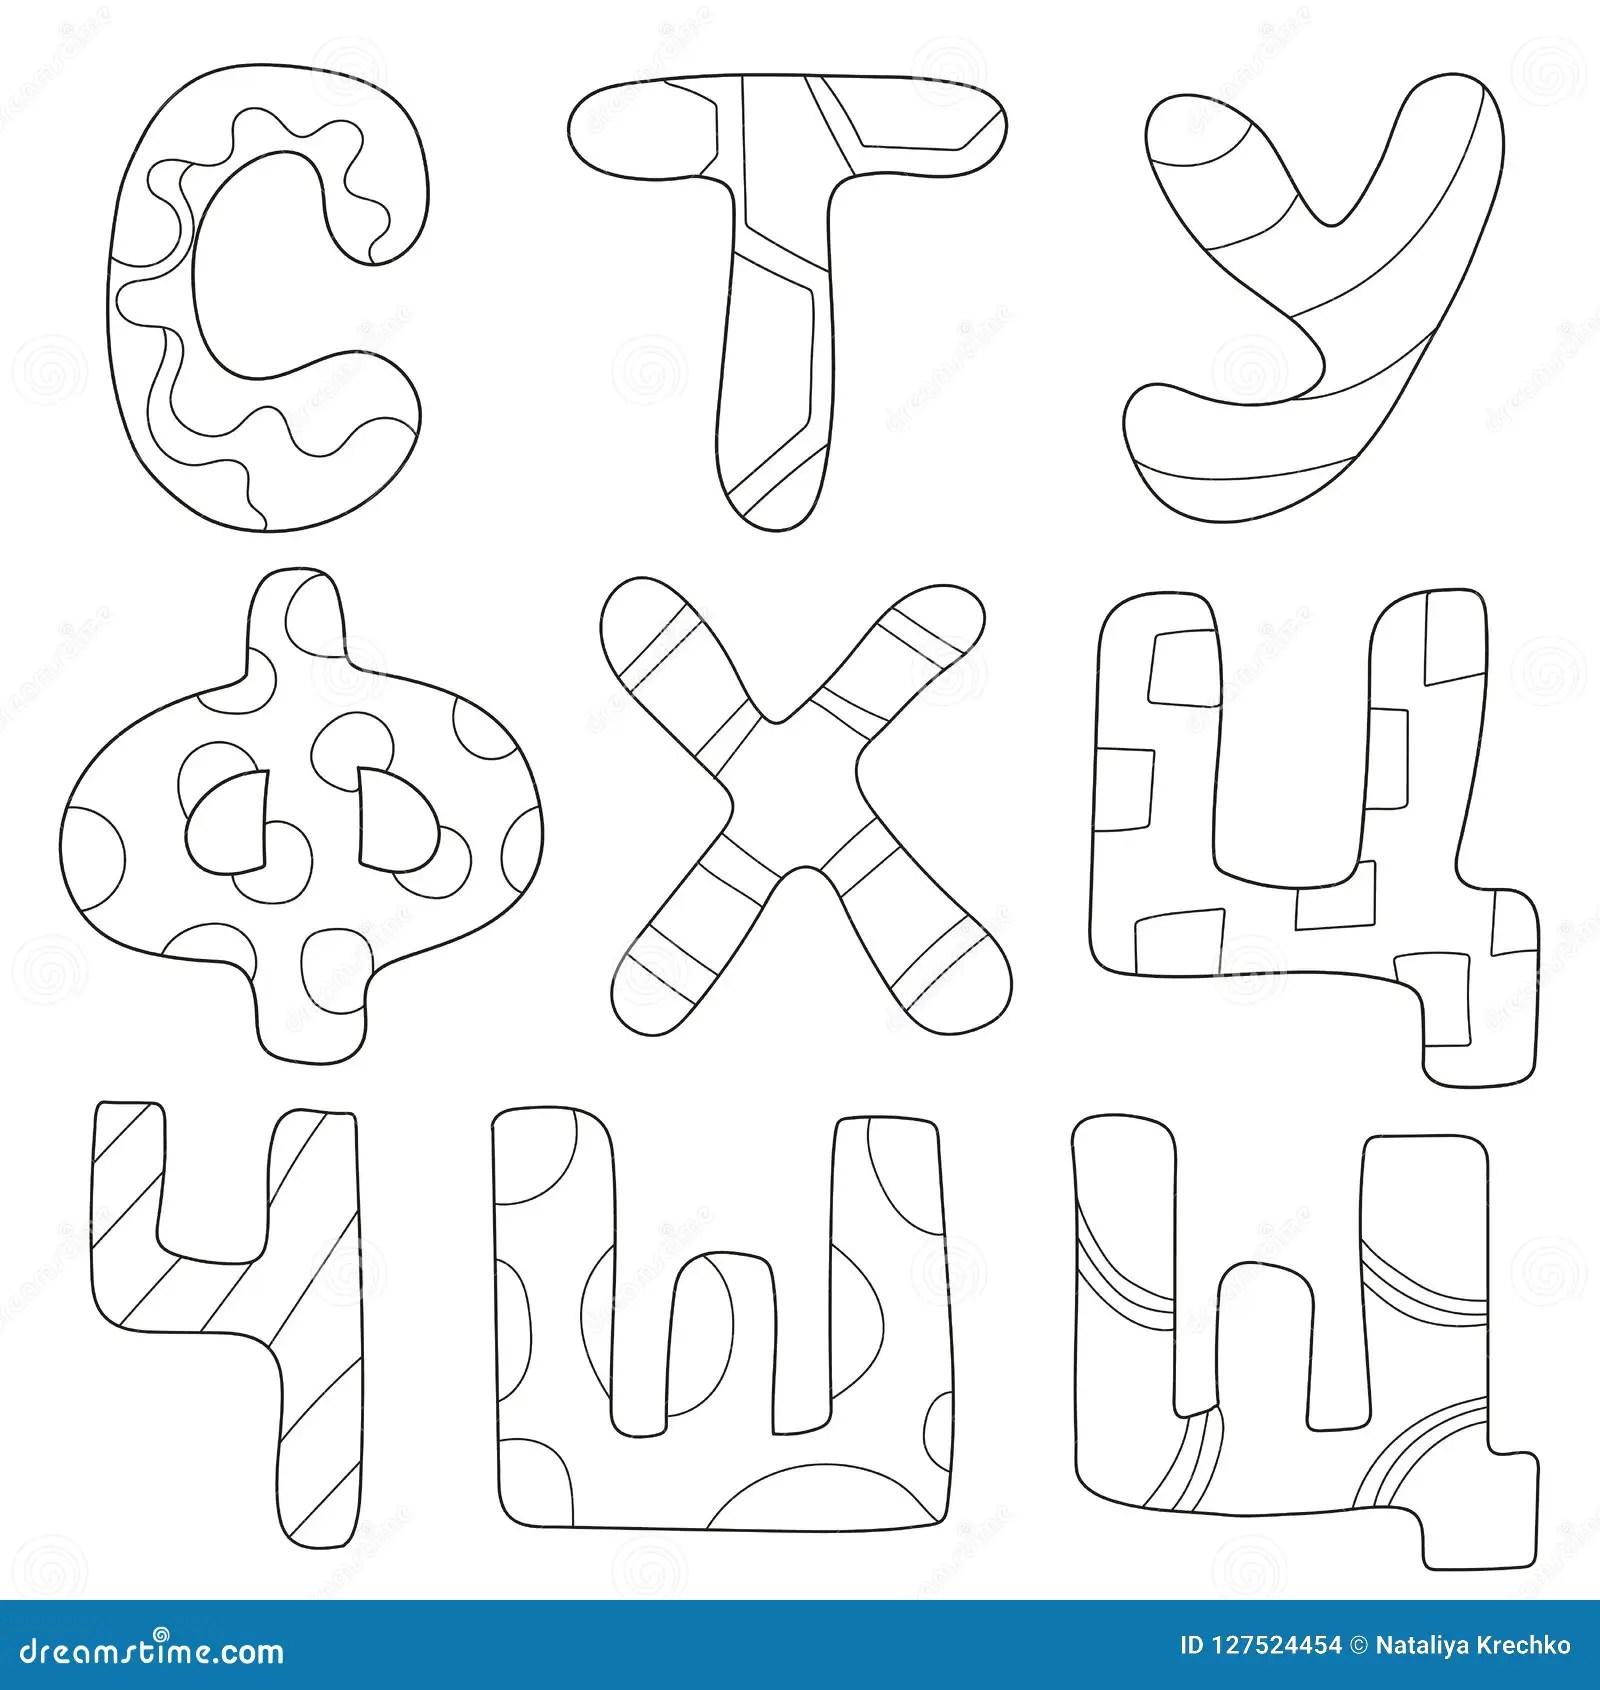 Cartoon Alphabet For Children Design Russian Letters For